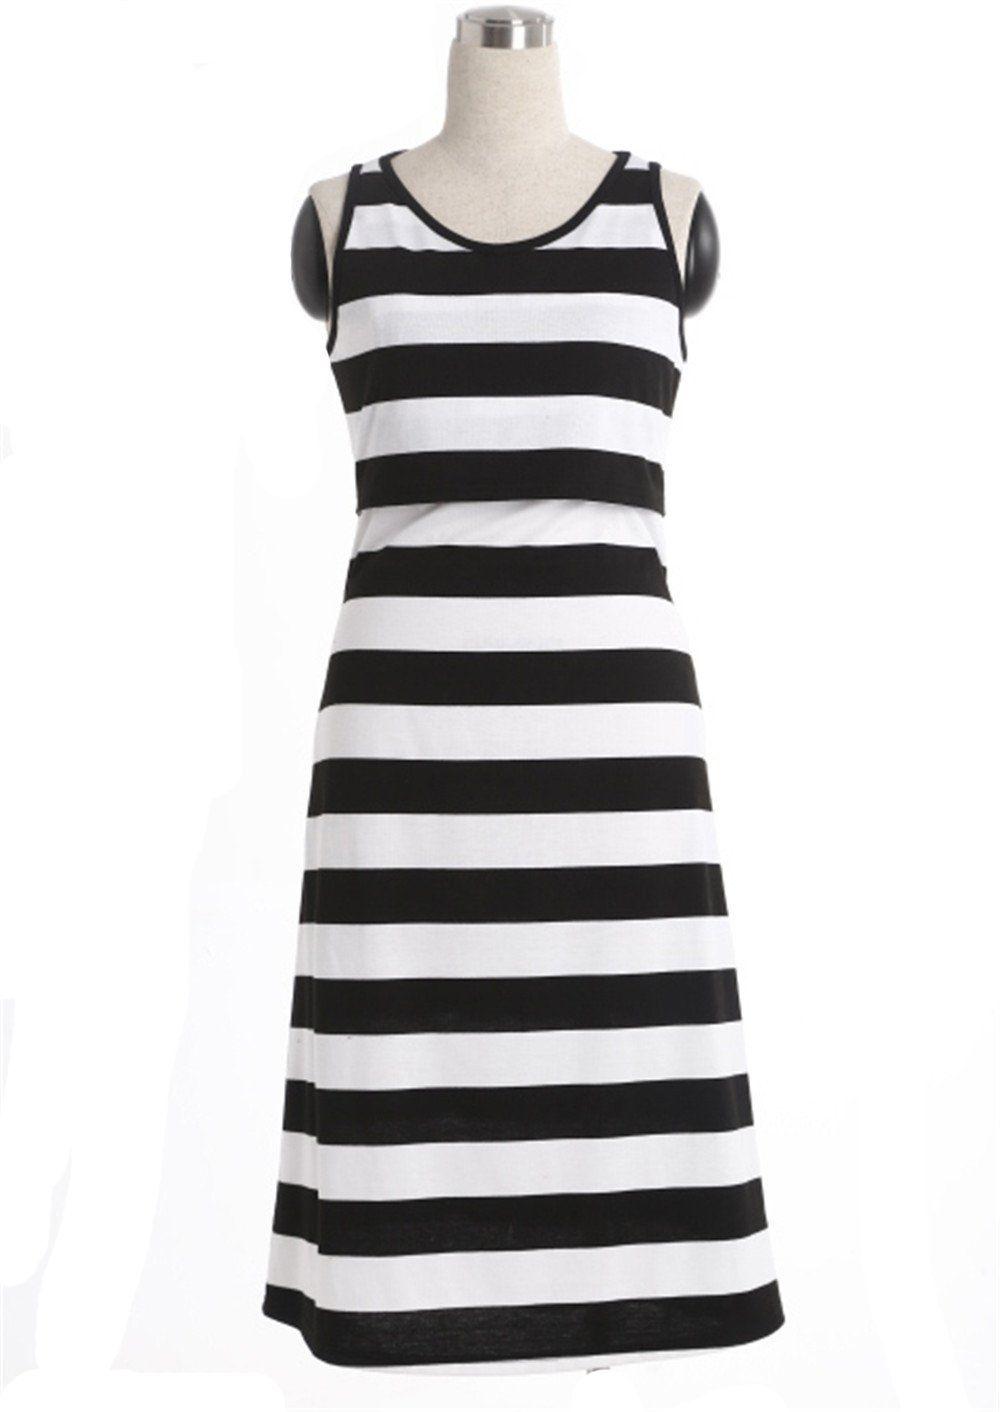 6e948e051c9f Maternity Styles - close-fitting maternity maxi dress   JWLG Striped  Maternity Pregnant Fulllength Clothing